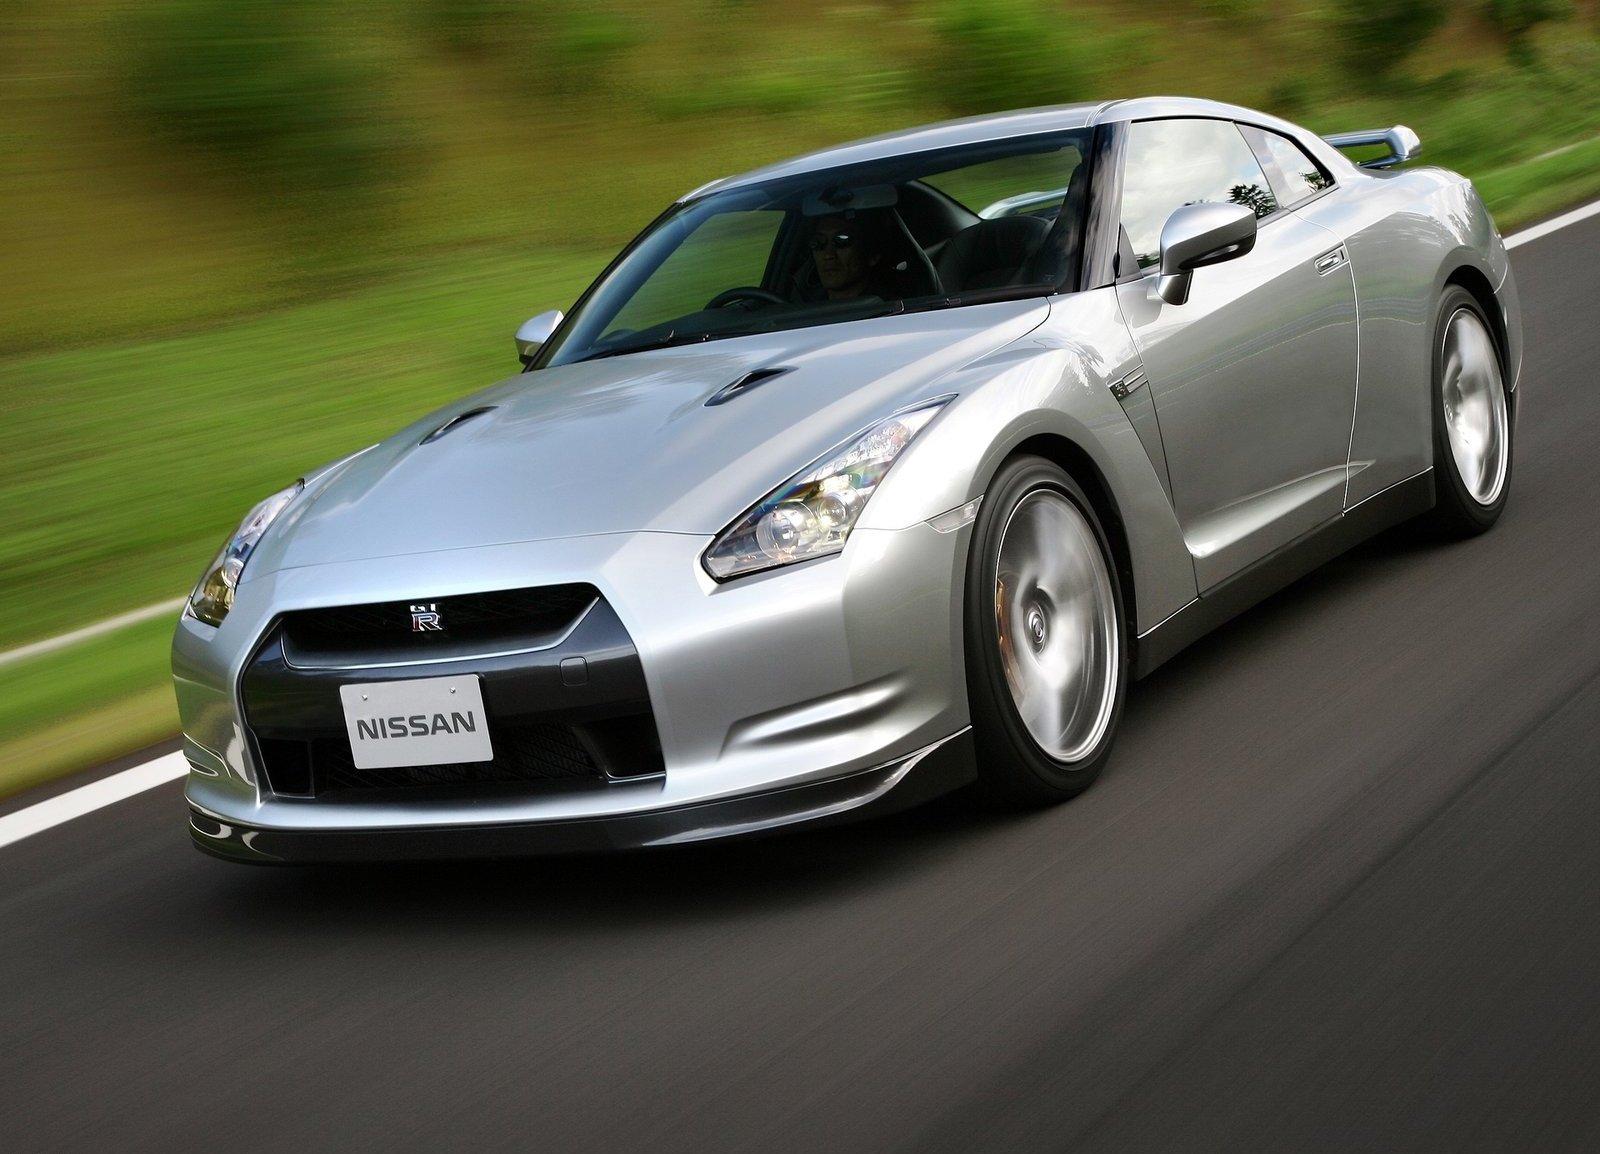 2008 Nissan GT-R silver